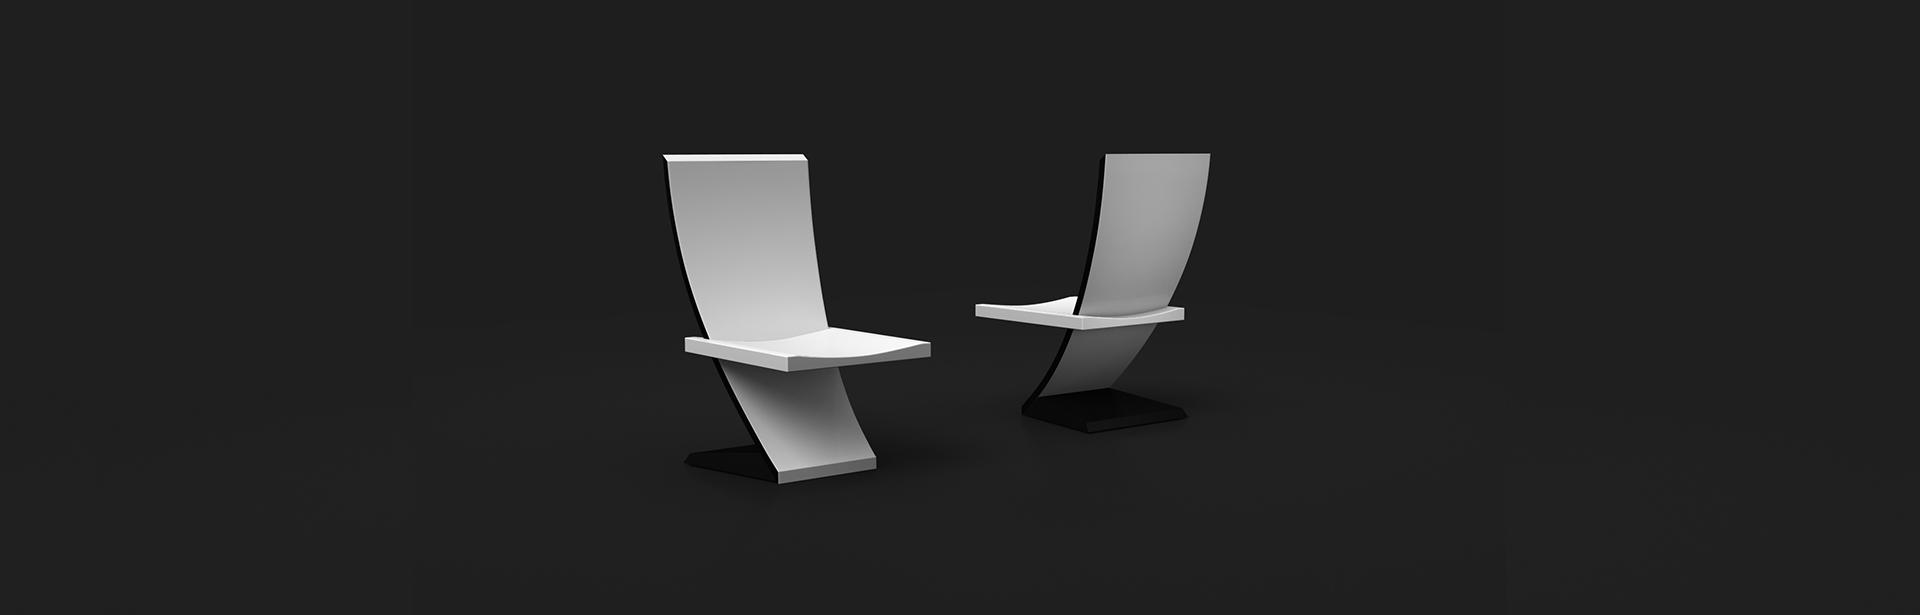 Theseus Chair   White | Custom Furniture | Your Custom Modern Design | 11  Ravens |